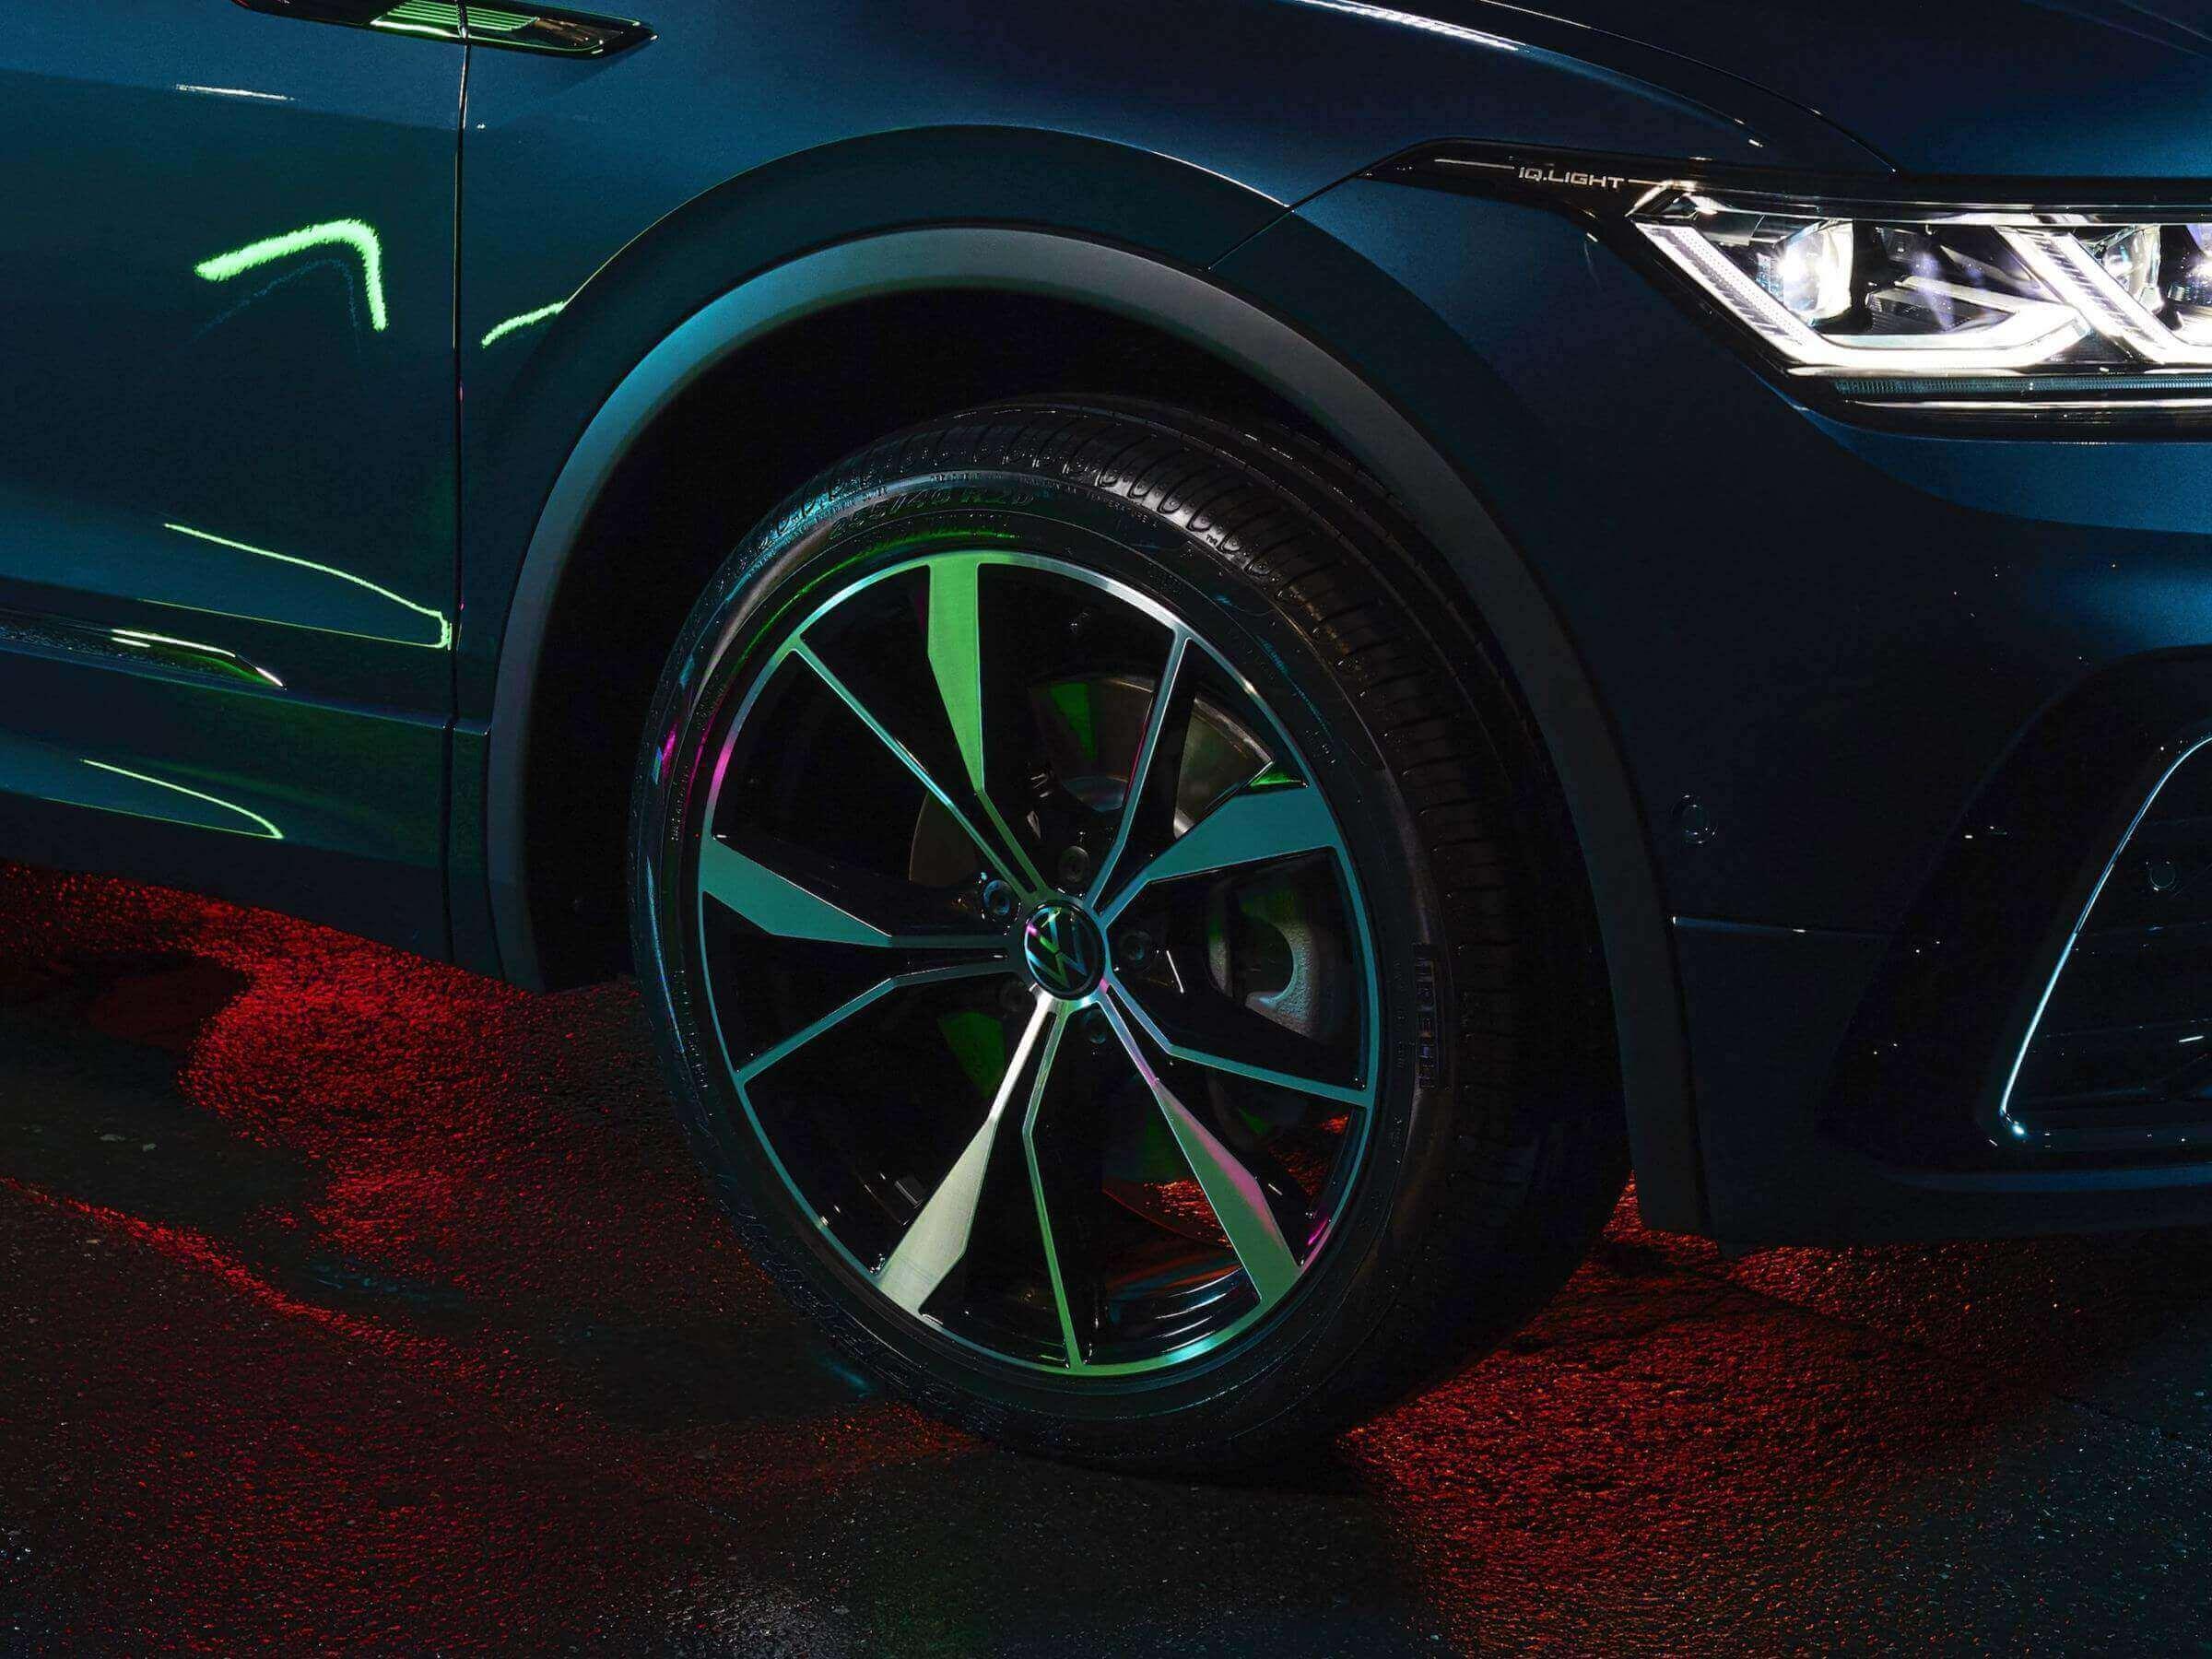 Confidence on wheels Alloy Wheels Image